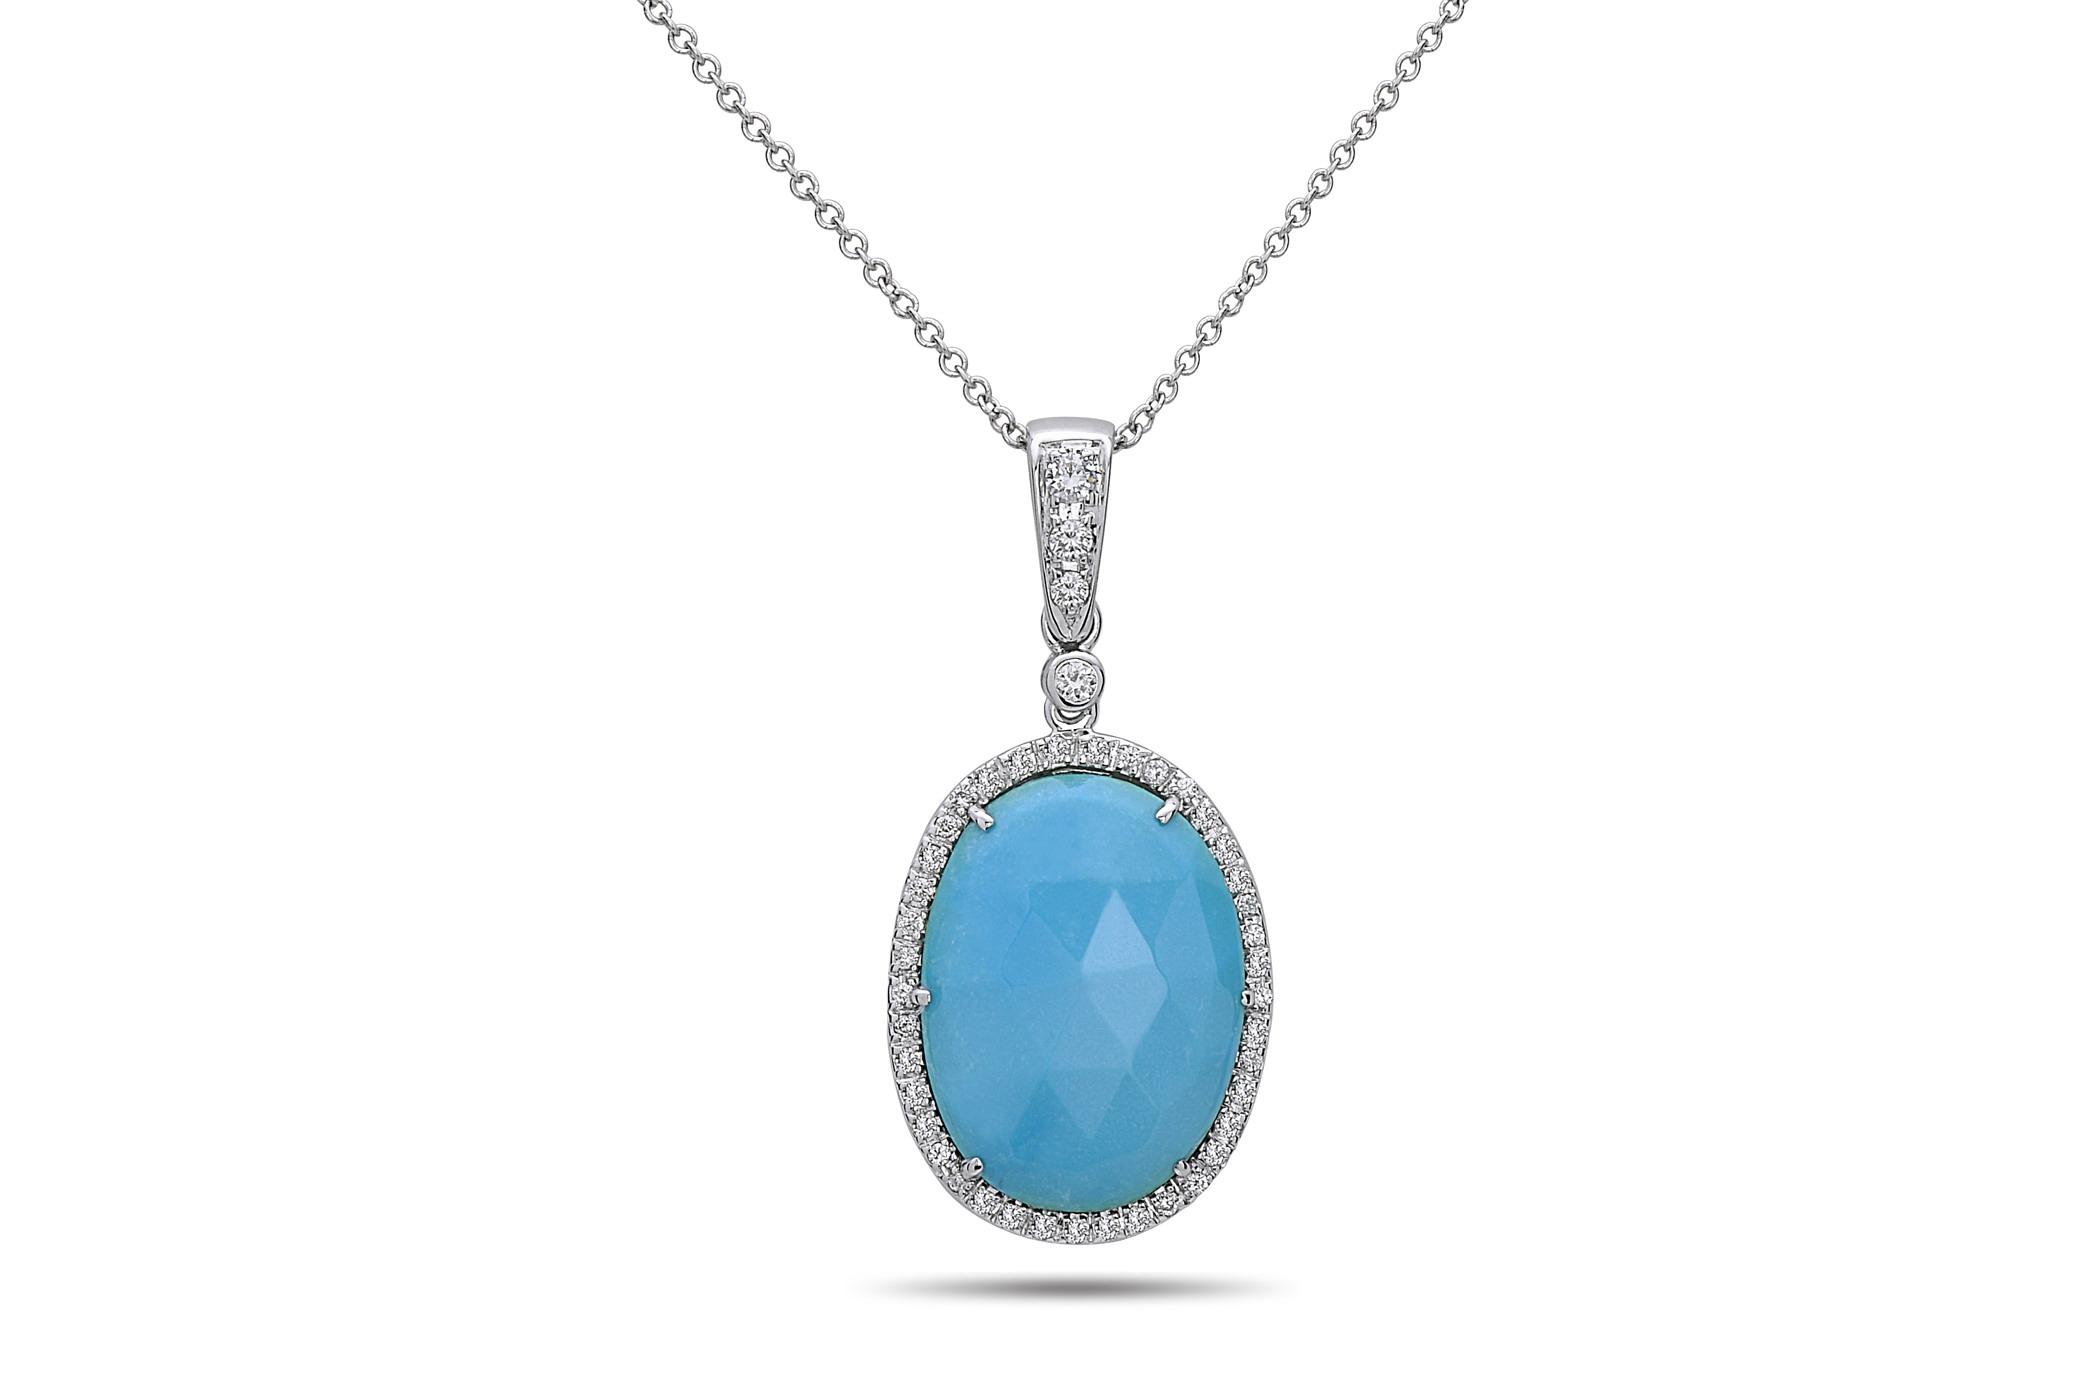 Turquoise & Diamond Pendant